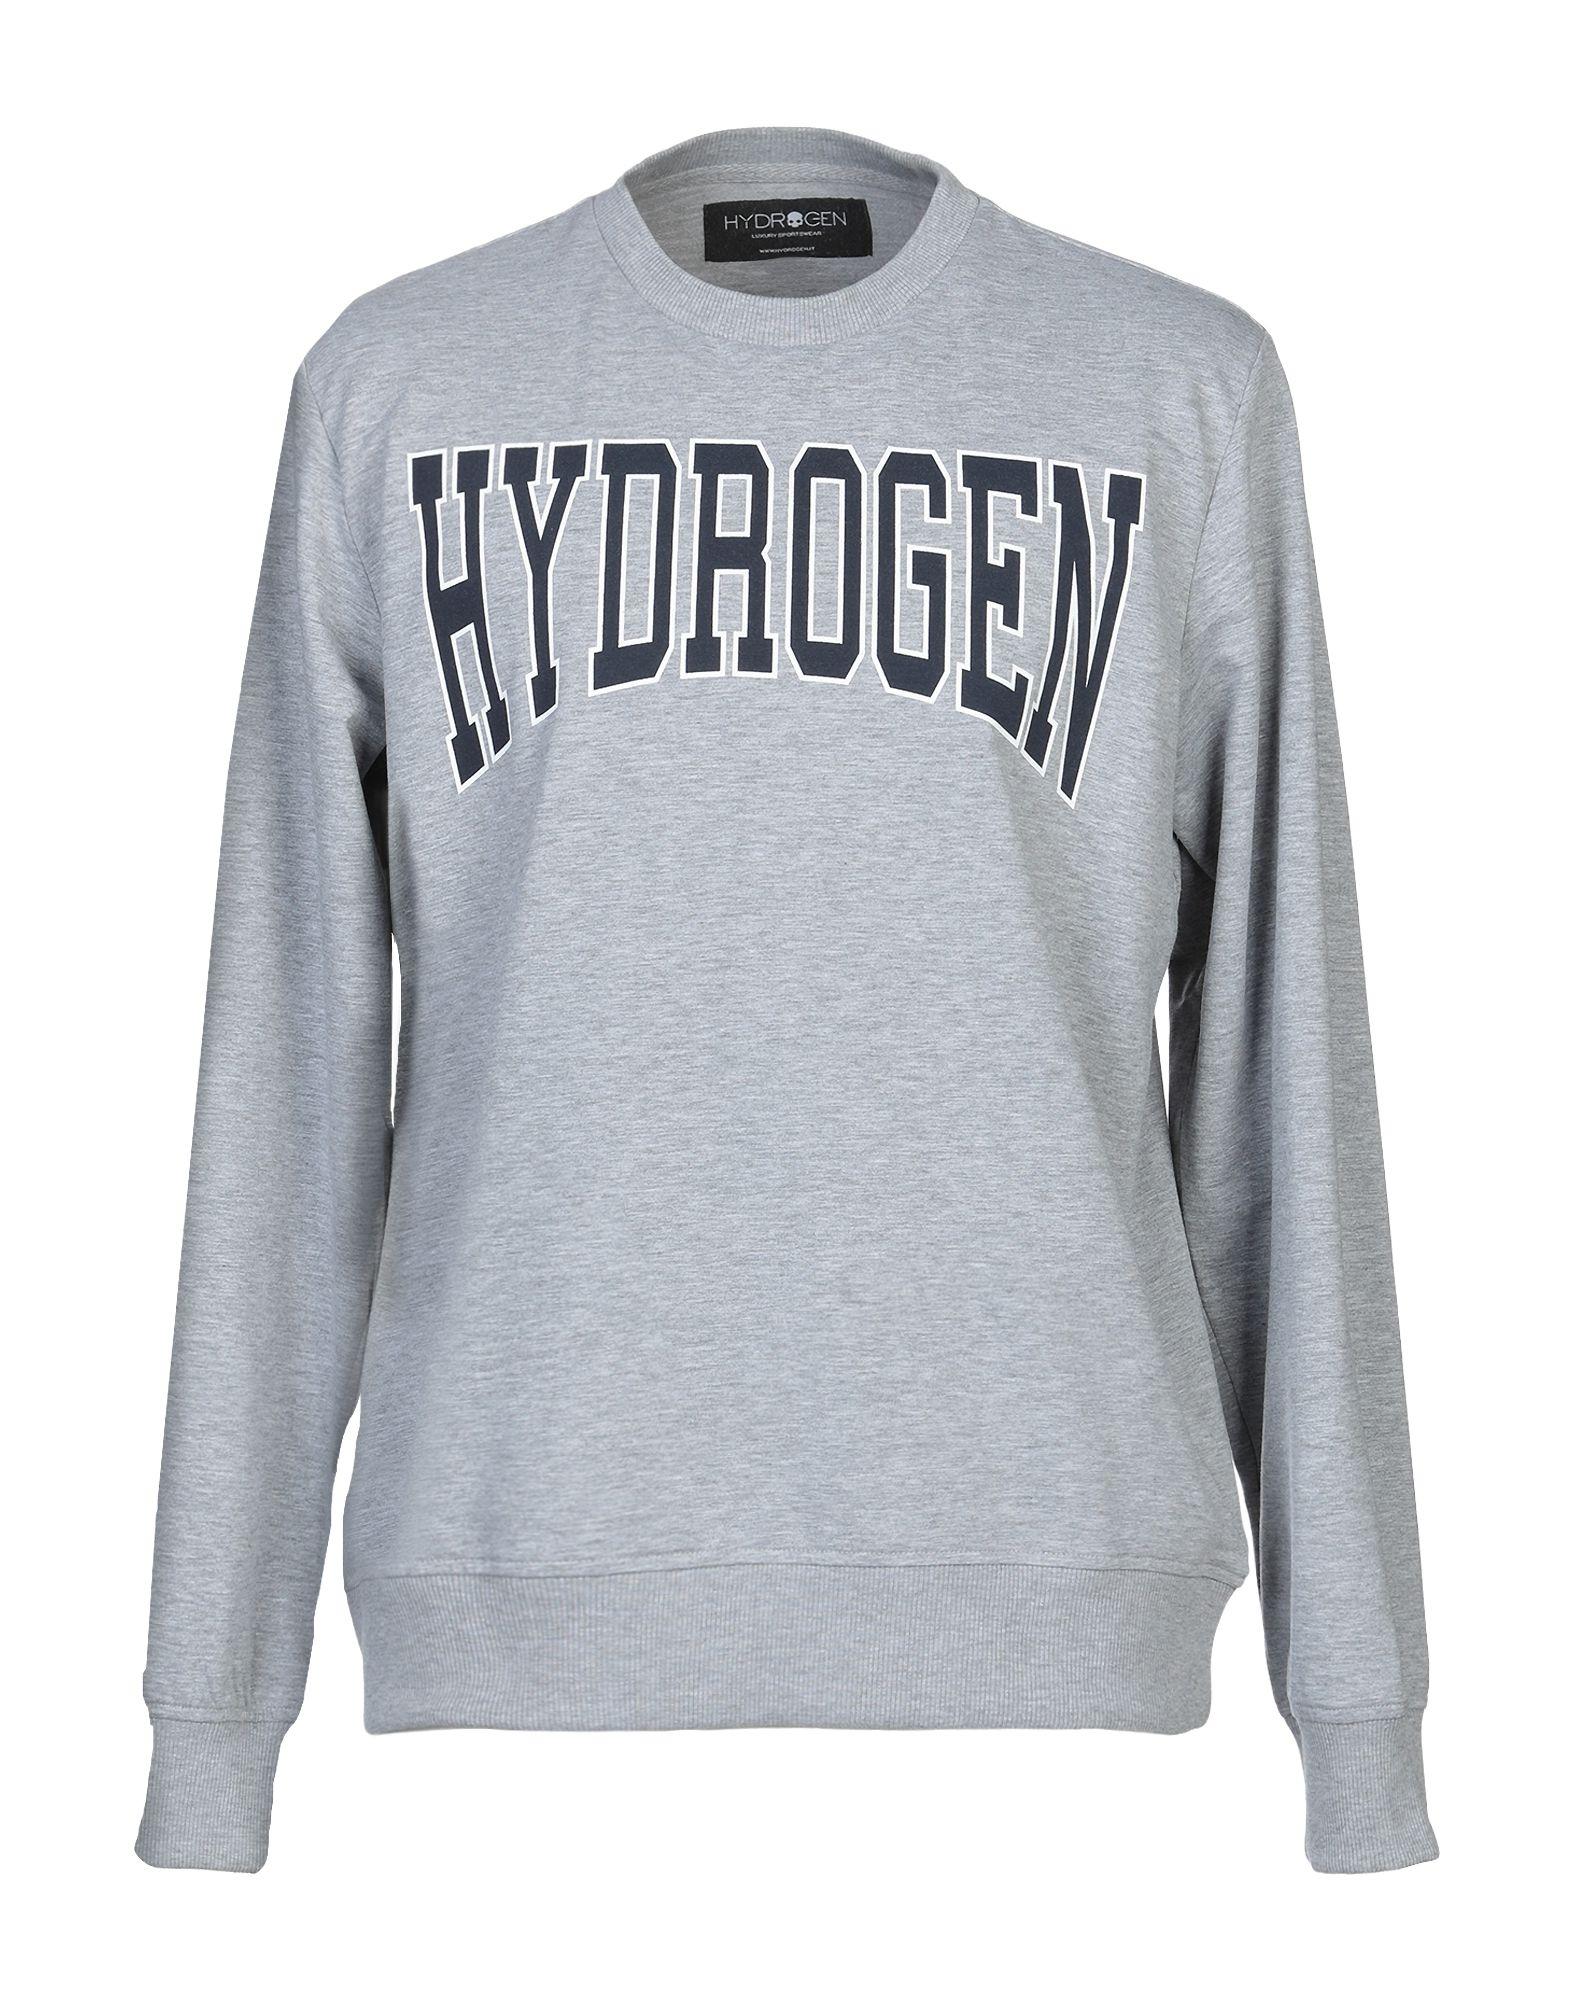 HYDROGEN Толстовка 380ml usb hydrogen water generator rechargeable portable water ionizer bottle electrolysis energy hydrogen rich antioxidant cup